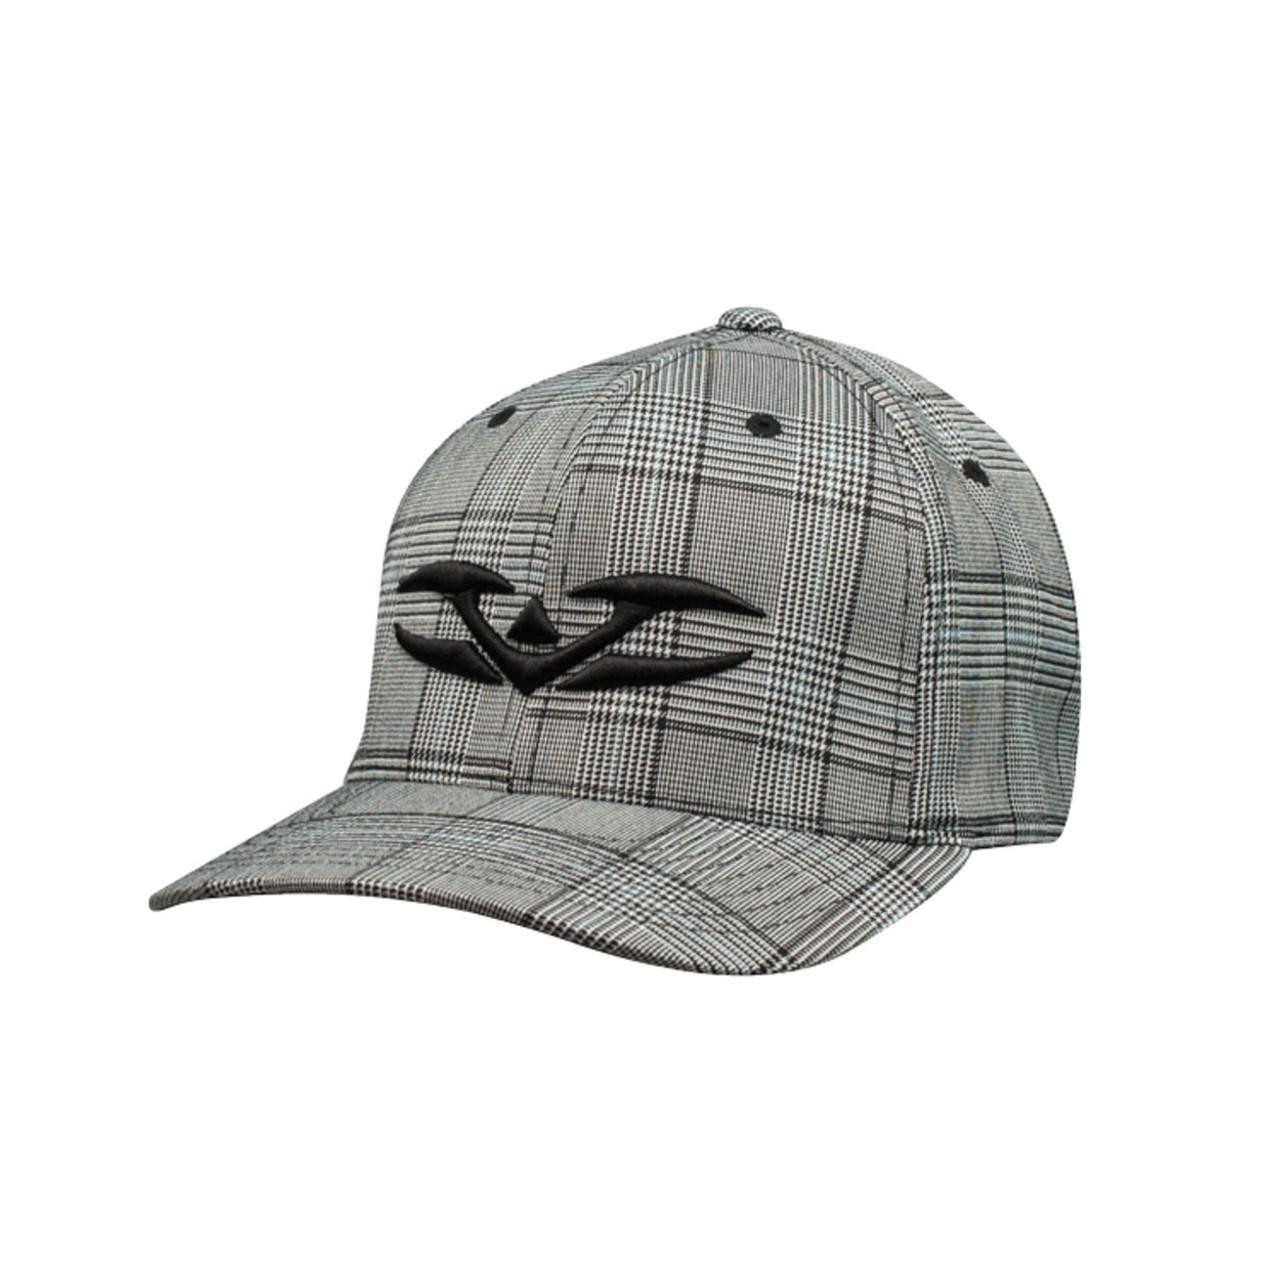 e60e7eb595242 Valken Hollywood Hat - Hero Outdoors